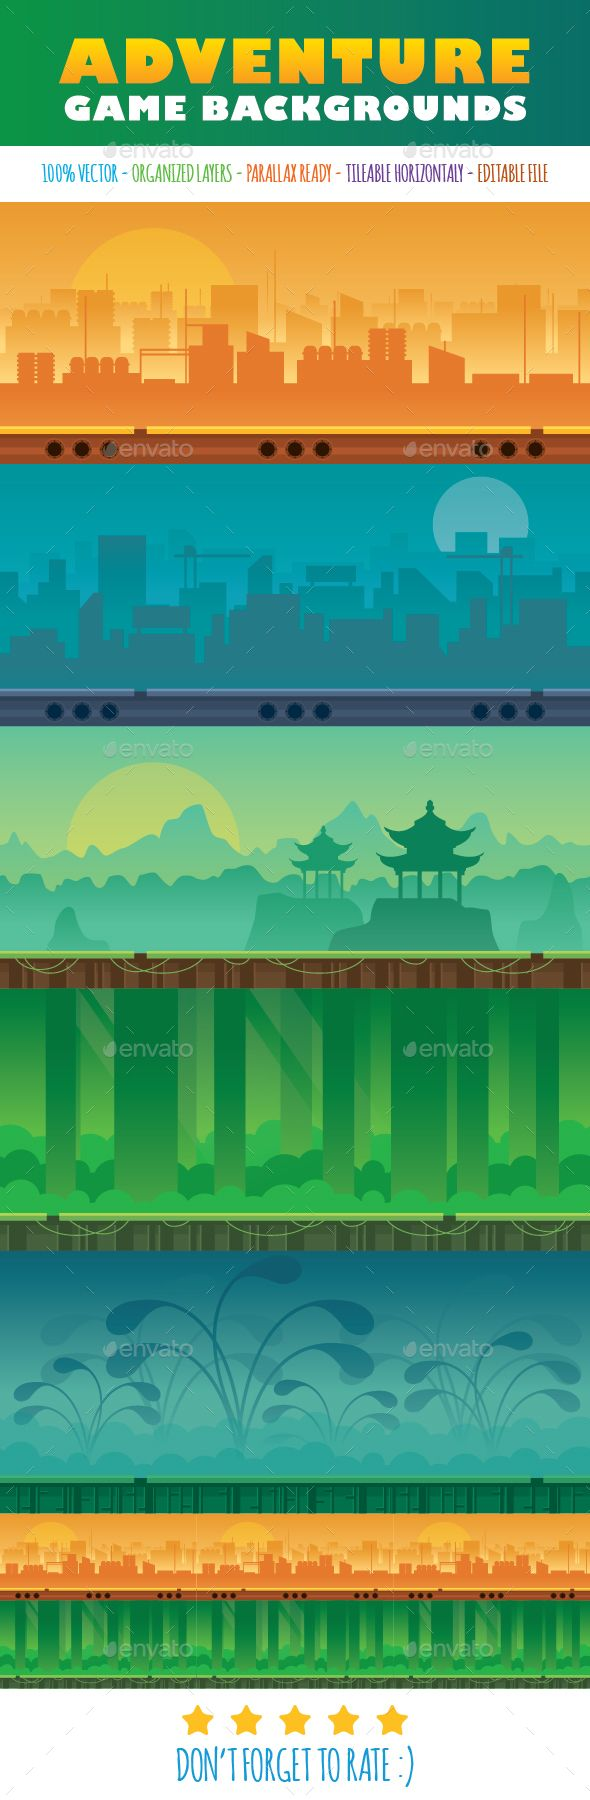 Adventure Game Background